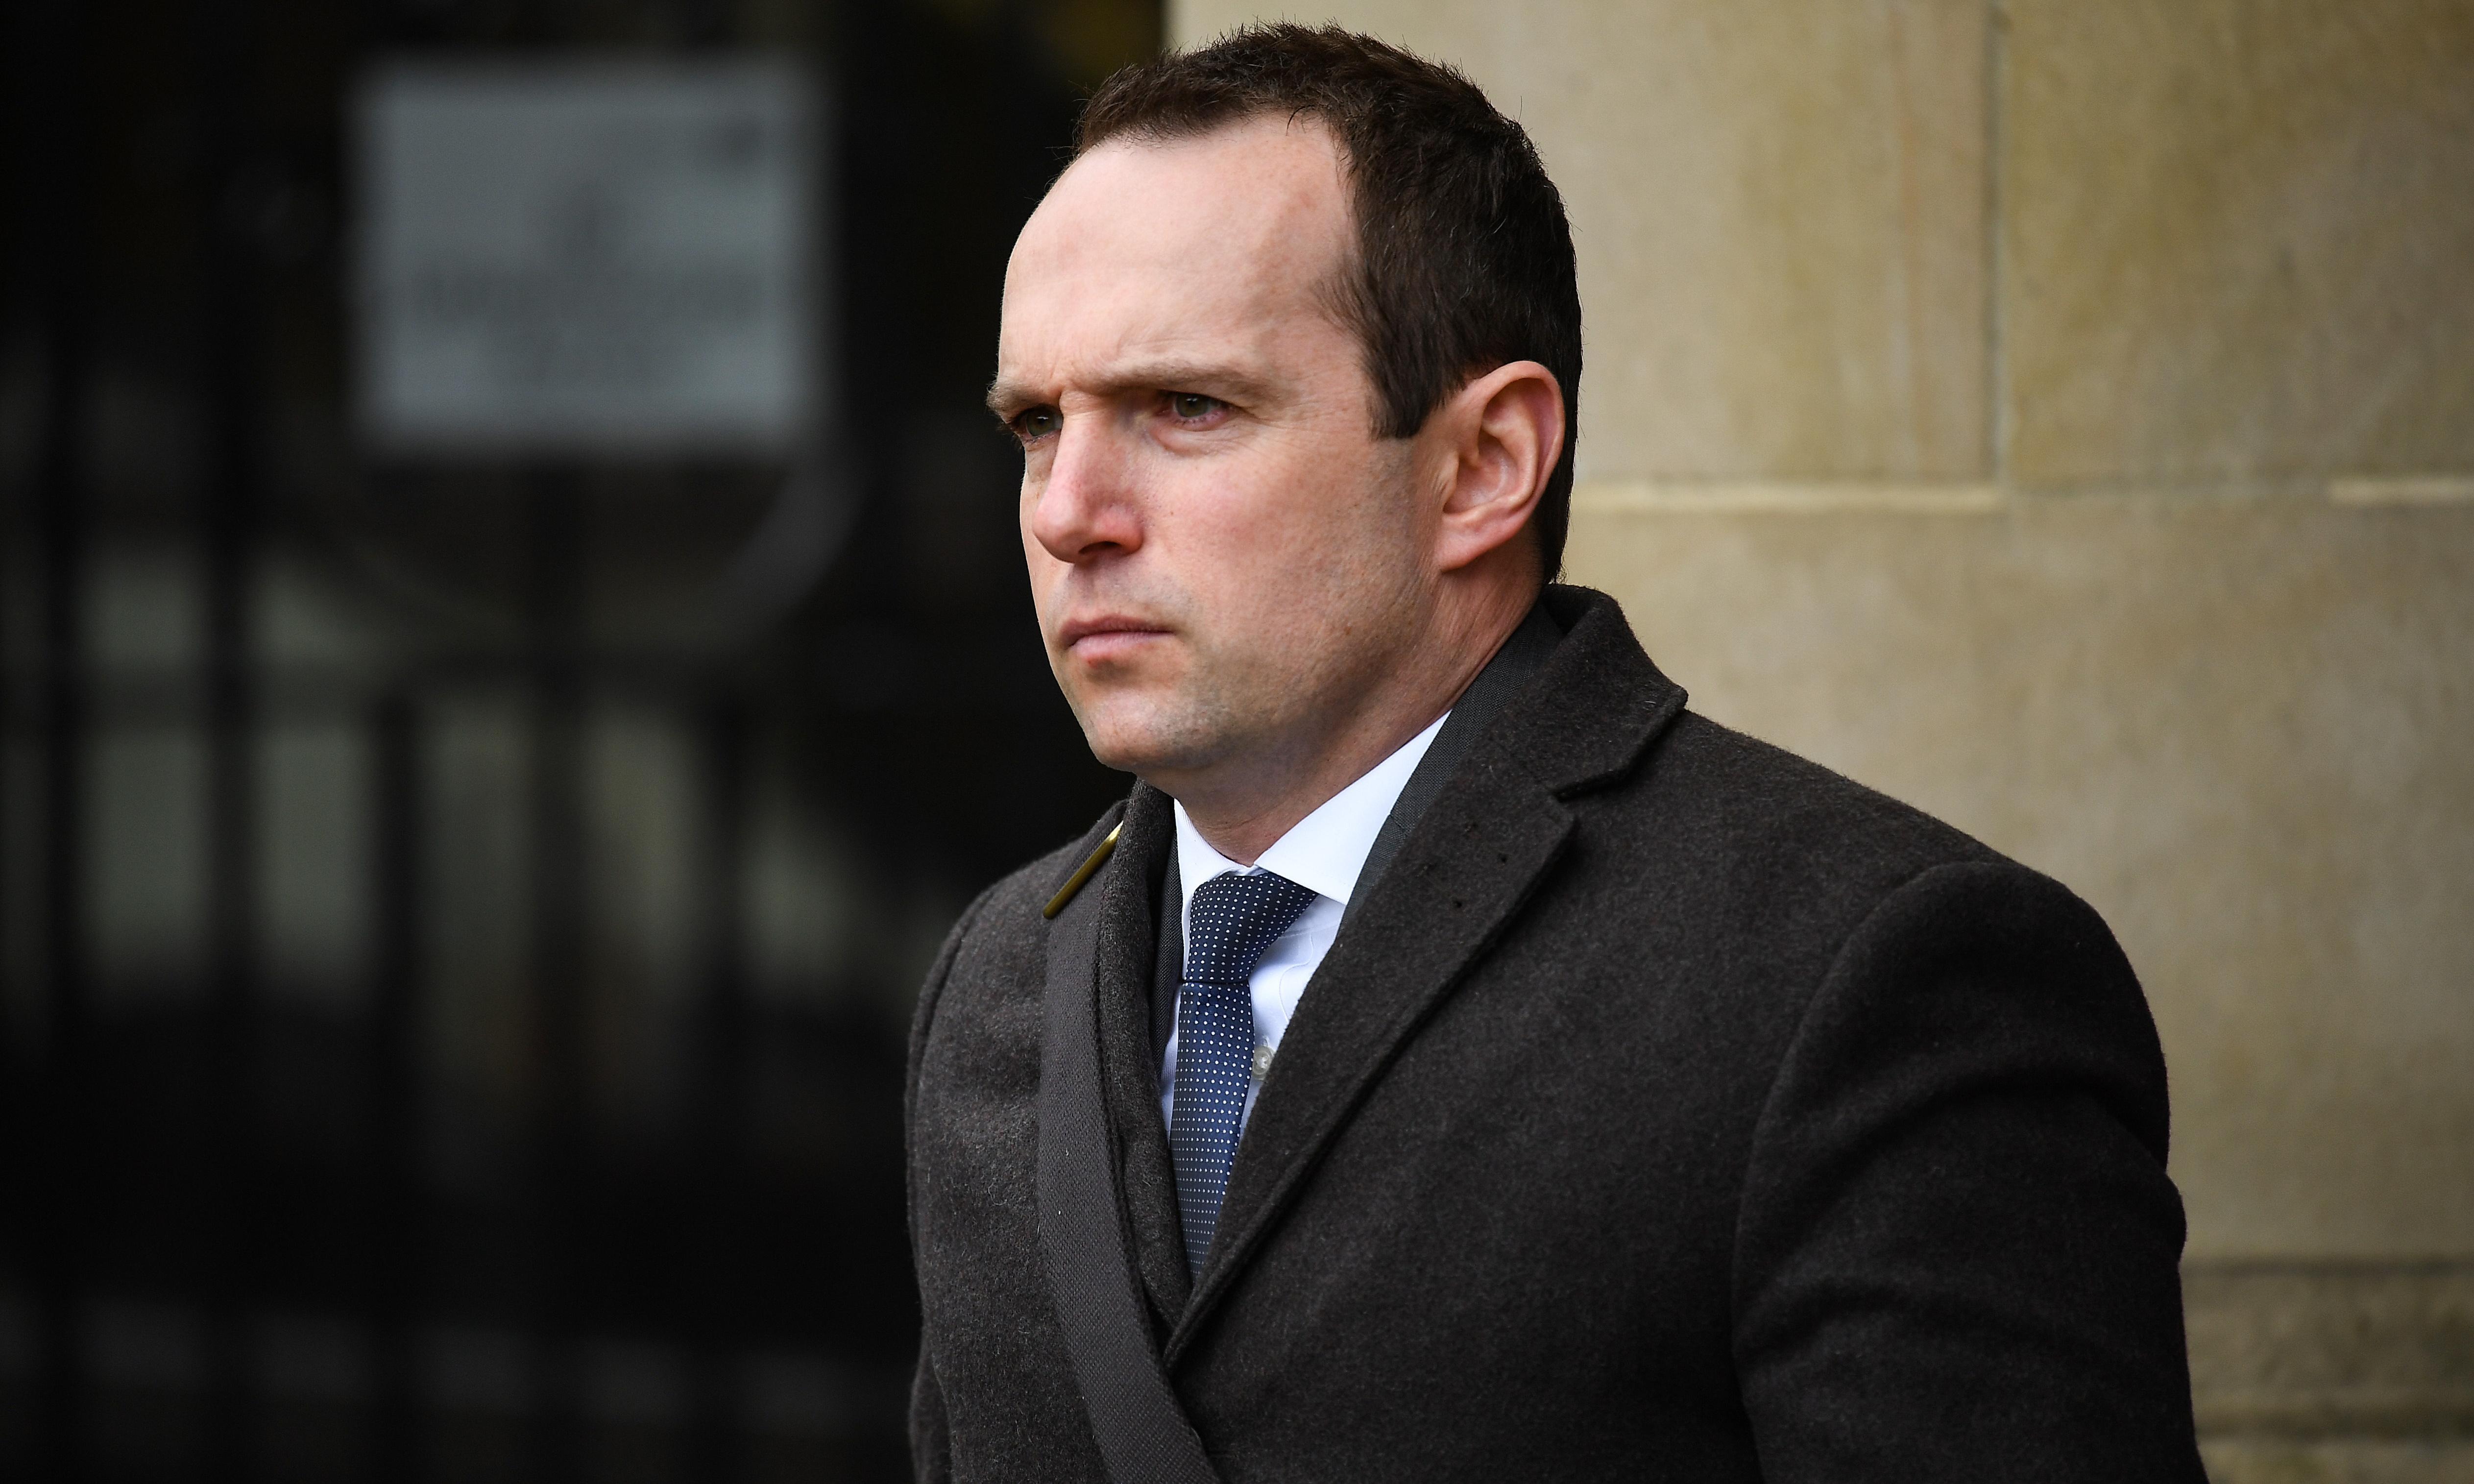 Alesha MacPhail murder trial: accused's mother testifies in court